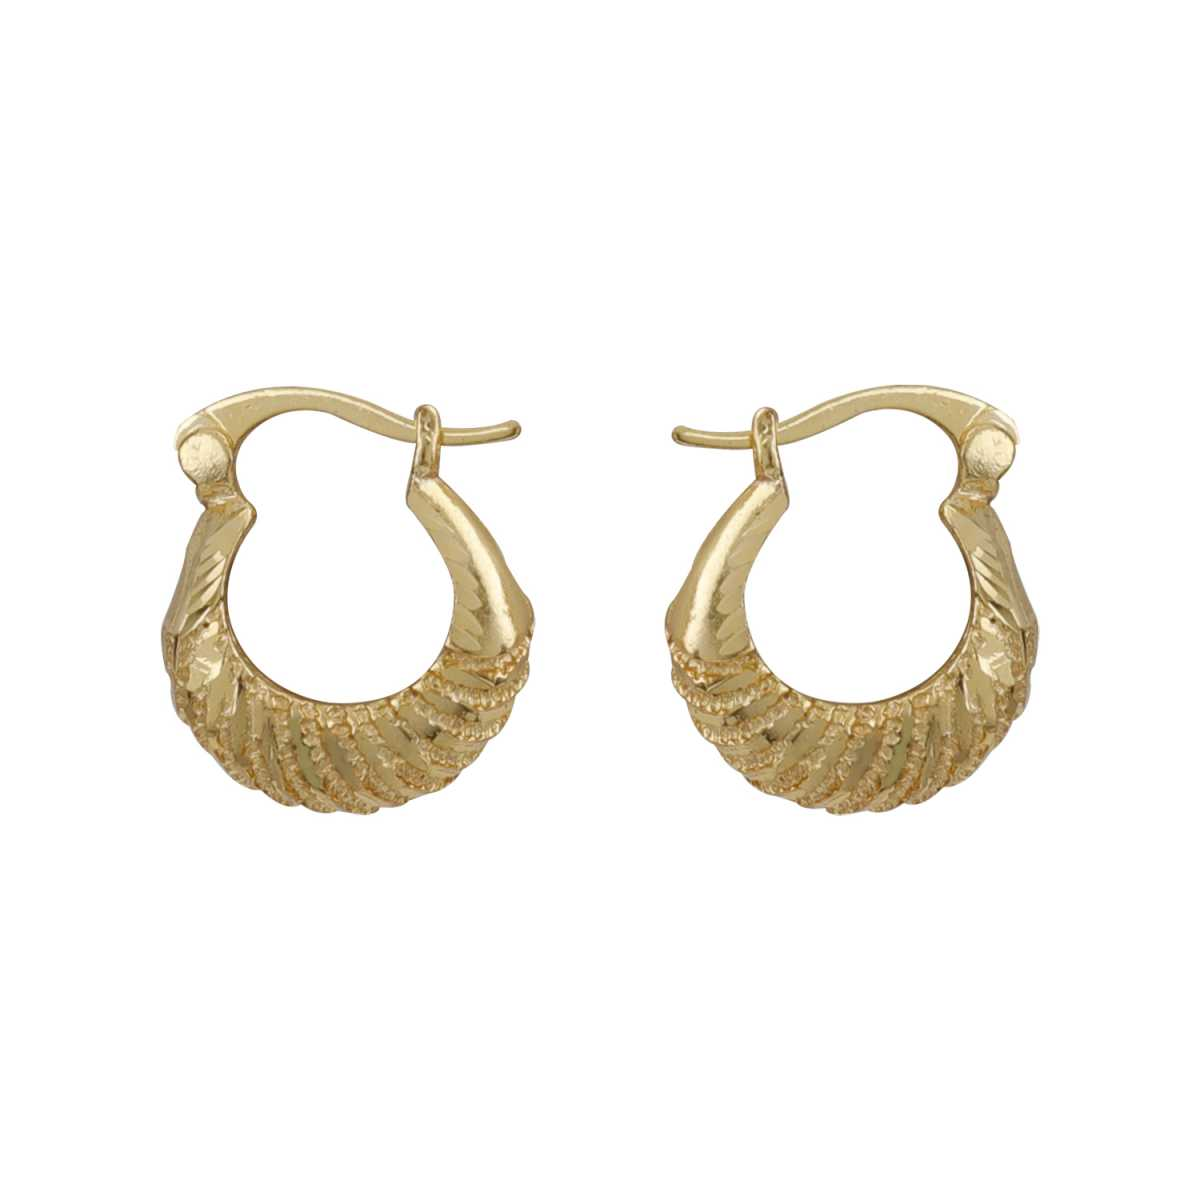 Silver Shine Fashionable Gold Trendy Small Sober Design Hoop Bali Earring